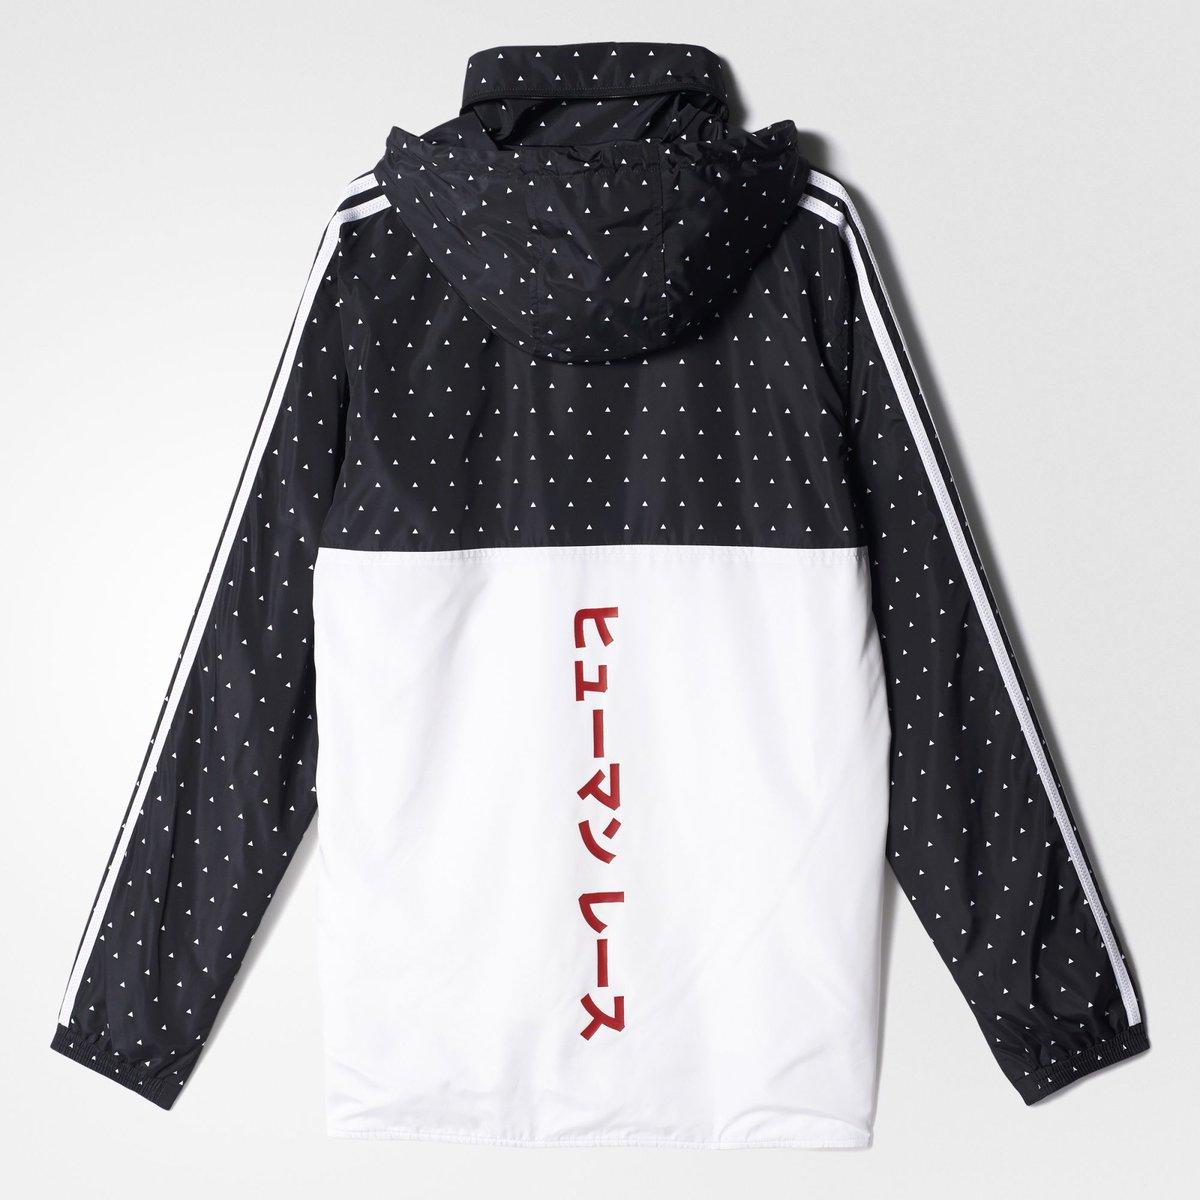 adidas x  Pharrell HU Woven Hoodie for  80 + FREE Shipping w  code BMSMNOV     http   goo.gl heV6Il pic.twitter.com OUspHBEtBX c0a81a93c